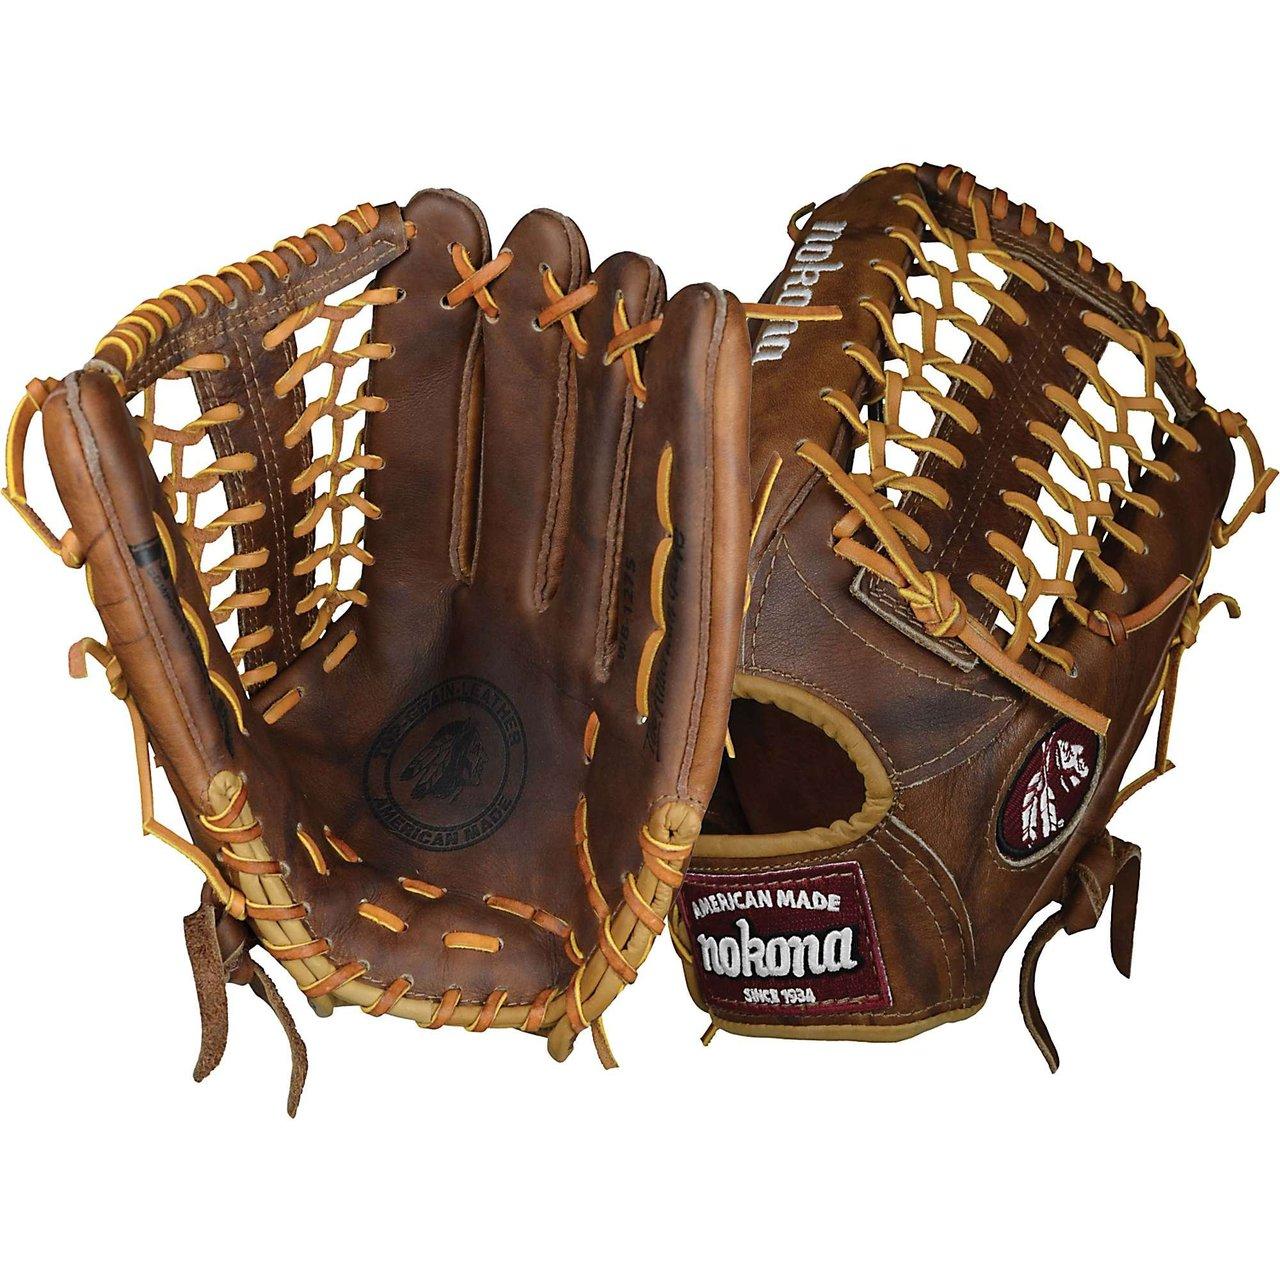 nokona-wb-1275m-walnut-baseball-glove-12-75-inch-right-handed-throw WB-1275M-Right Handed Throw Nokona 808808889083 Nokona classic walnut leather baseball glove with modified trap web and